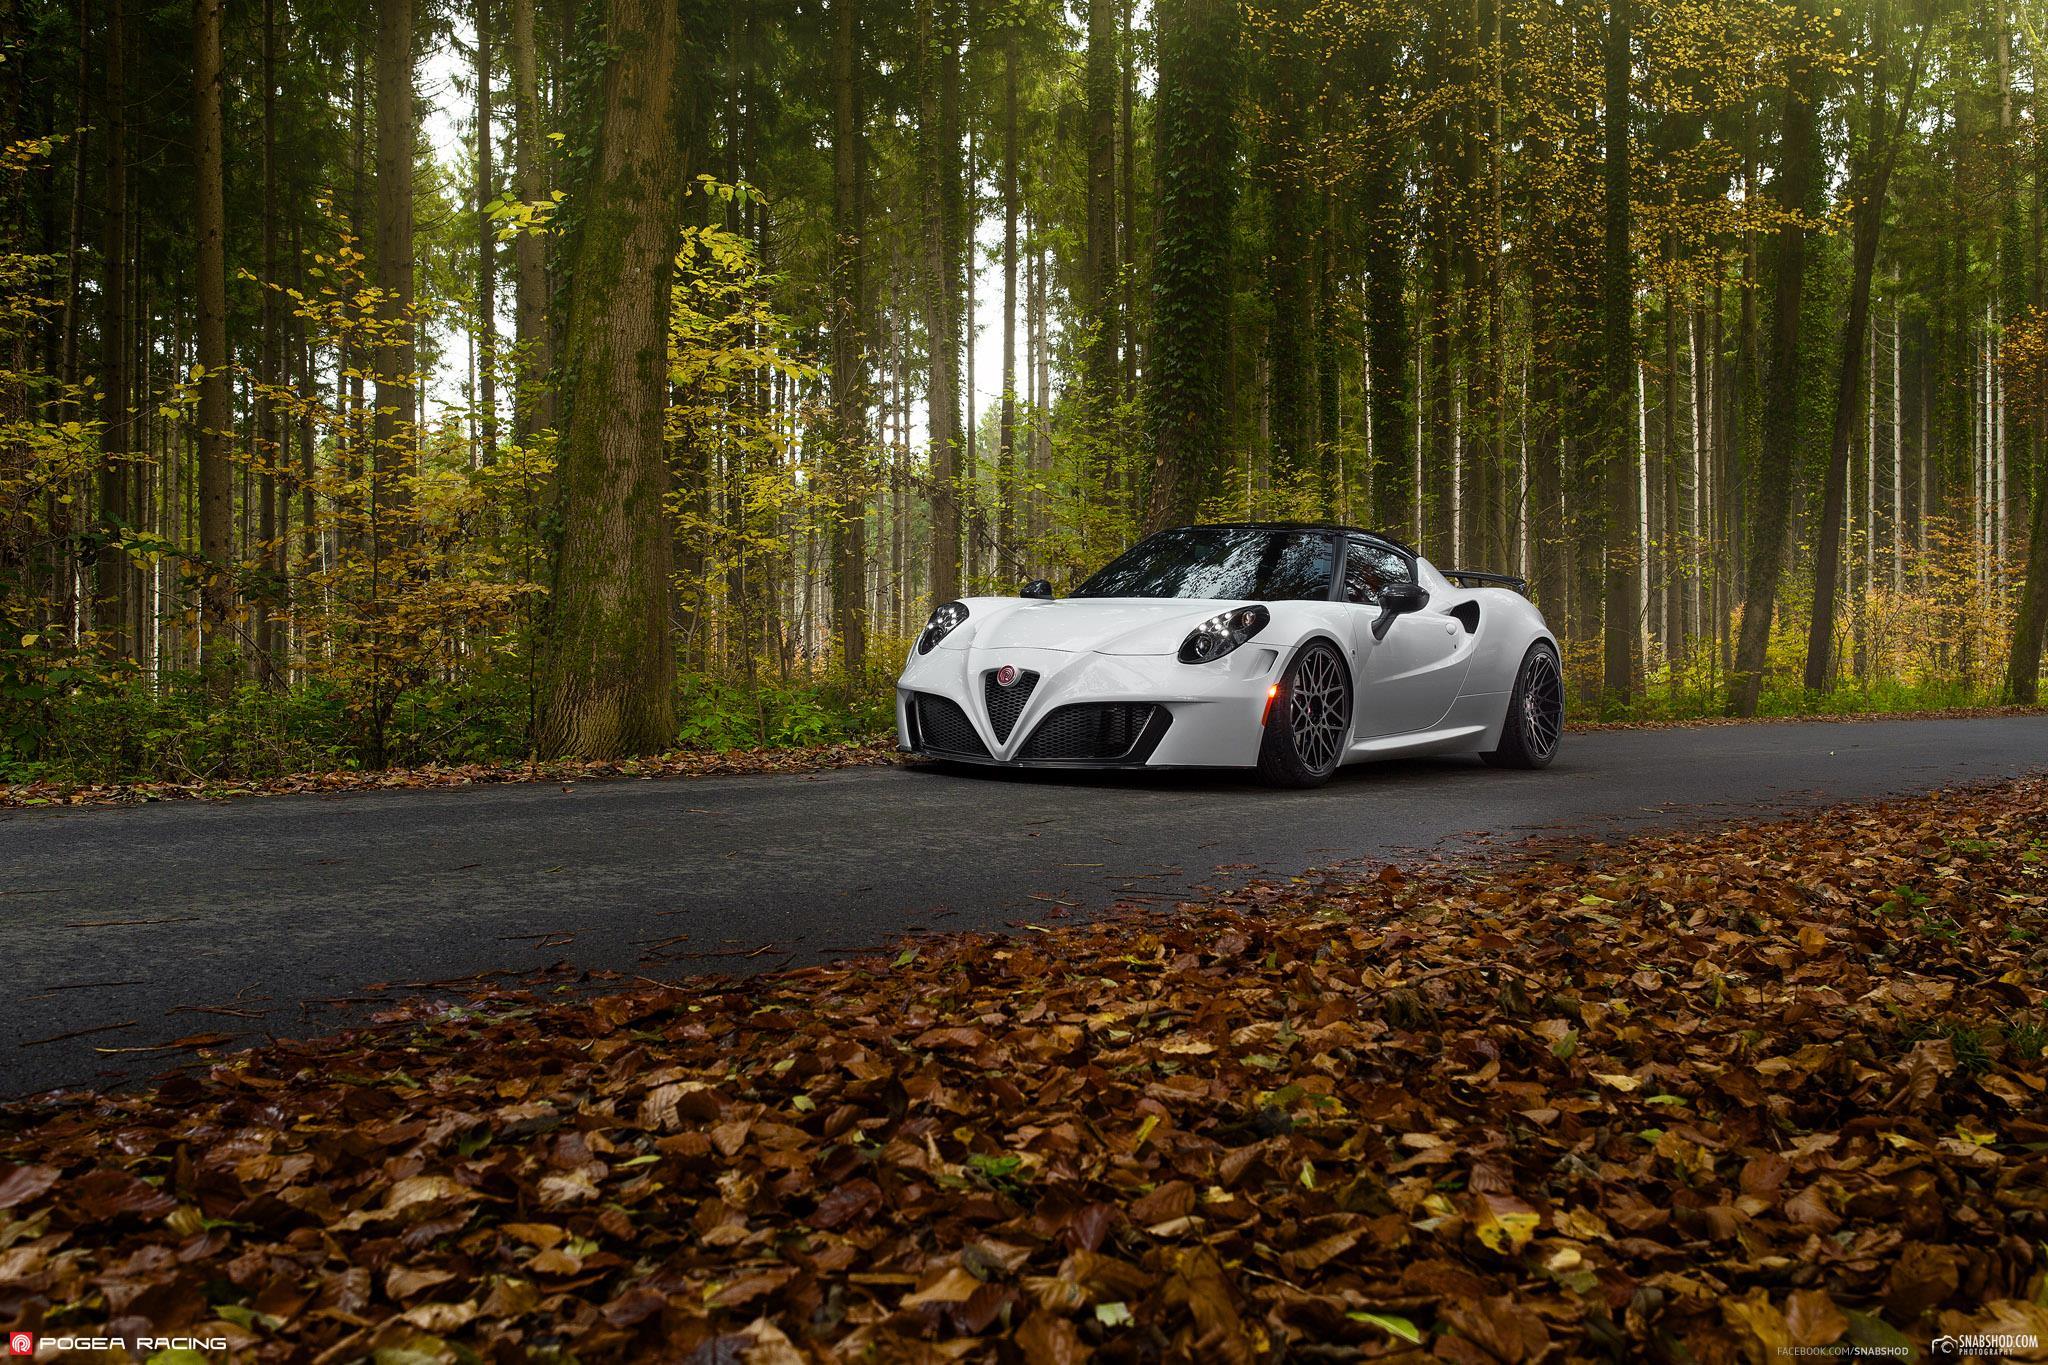 Alfa Romeo C Tuned By Pogea Racing Italian Beauty Meets The German Touch Photo Gallery